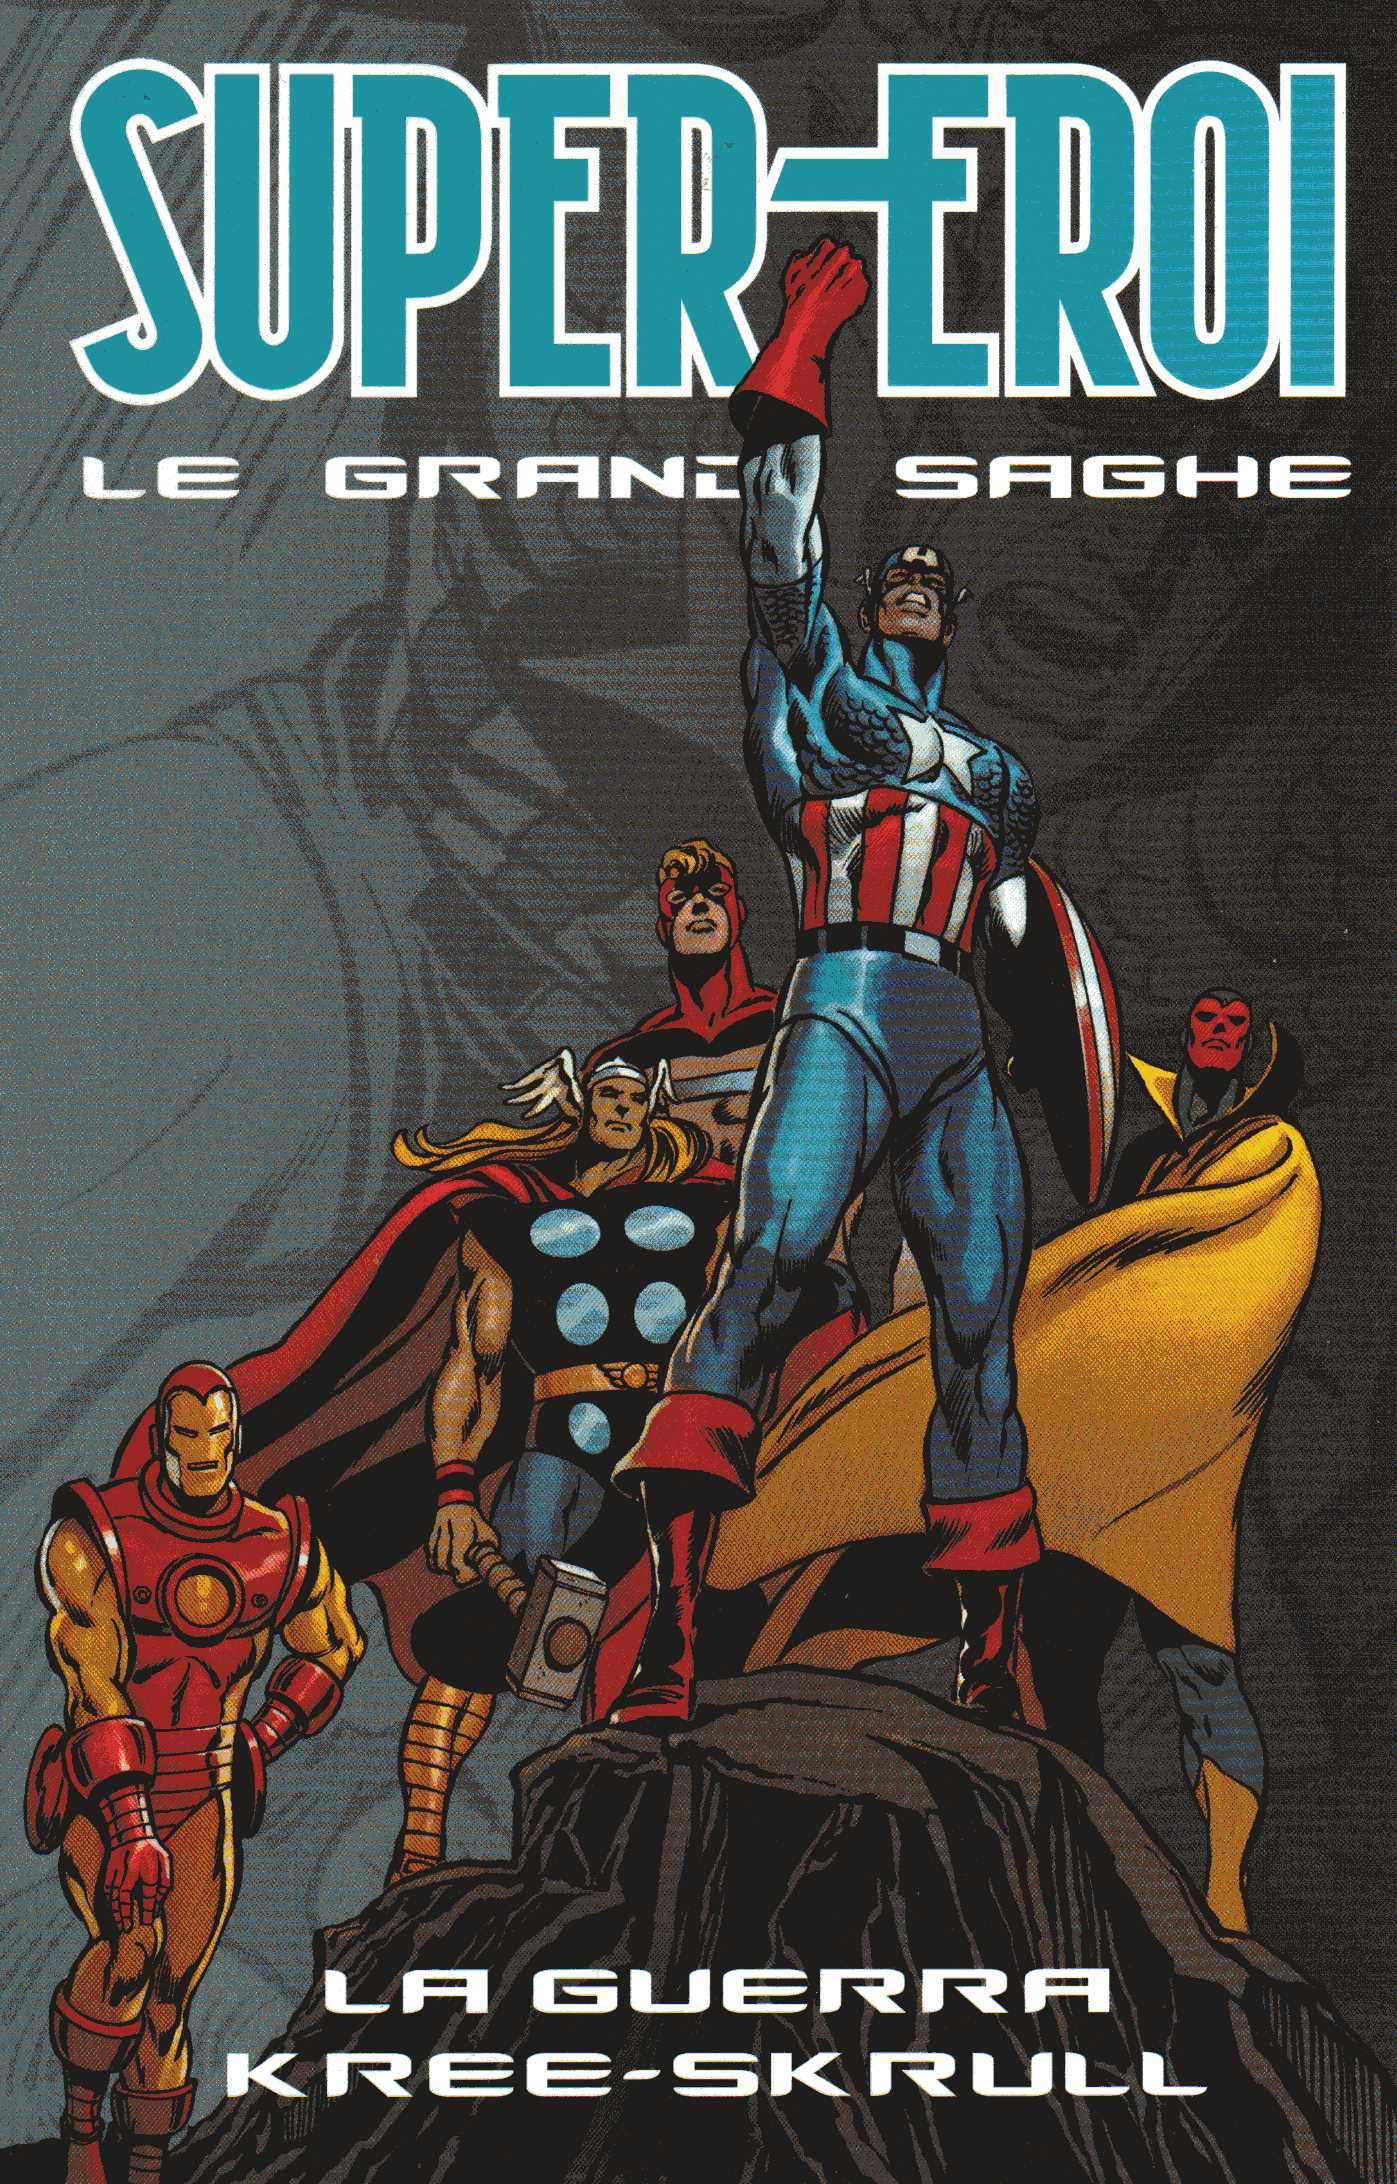 Supereroi - Le grandi saghe vol. 14